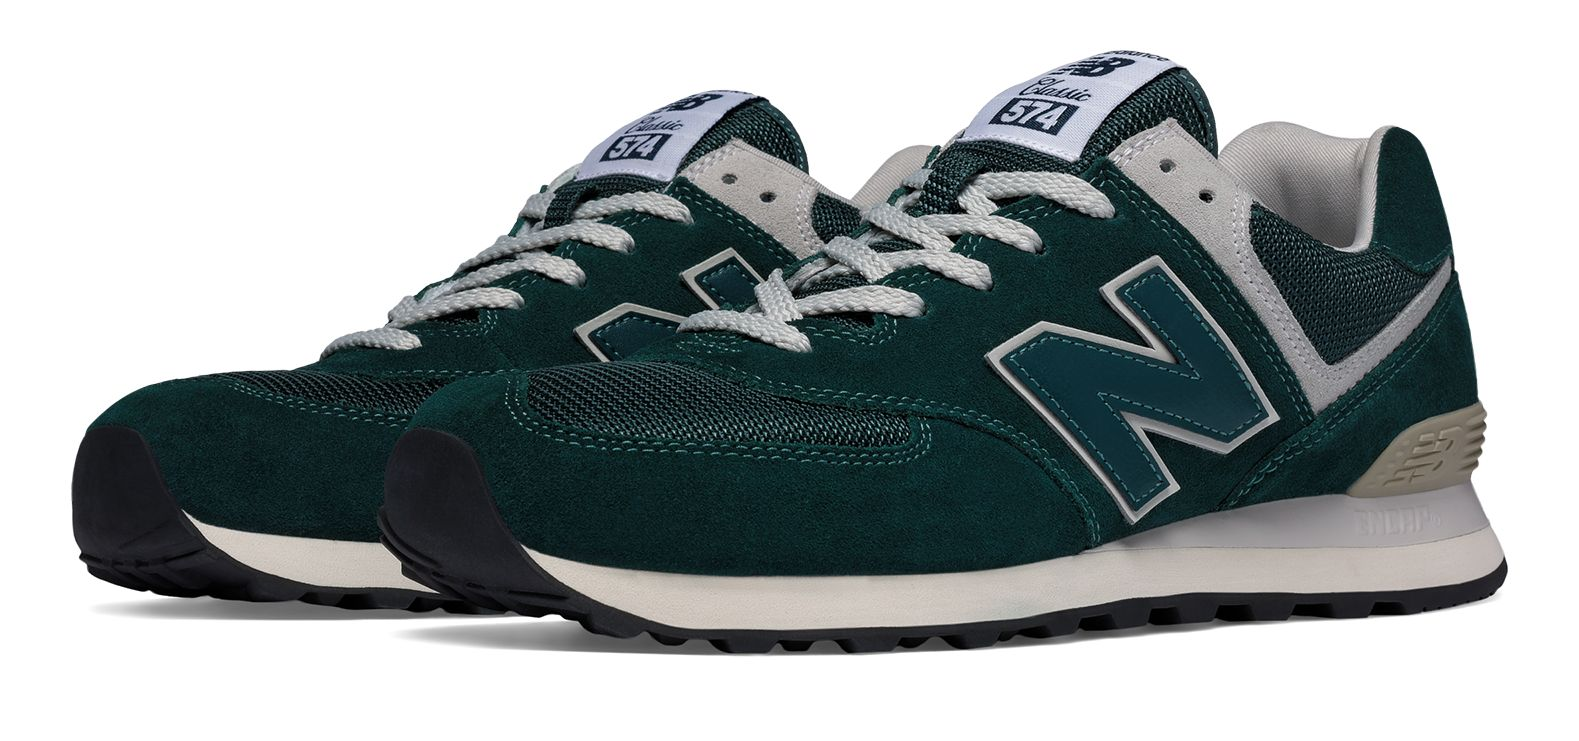 New Balance : New Balance 574 : Men's Footwear Outlet : ML574FBF